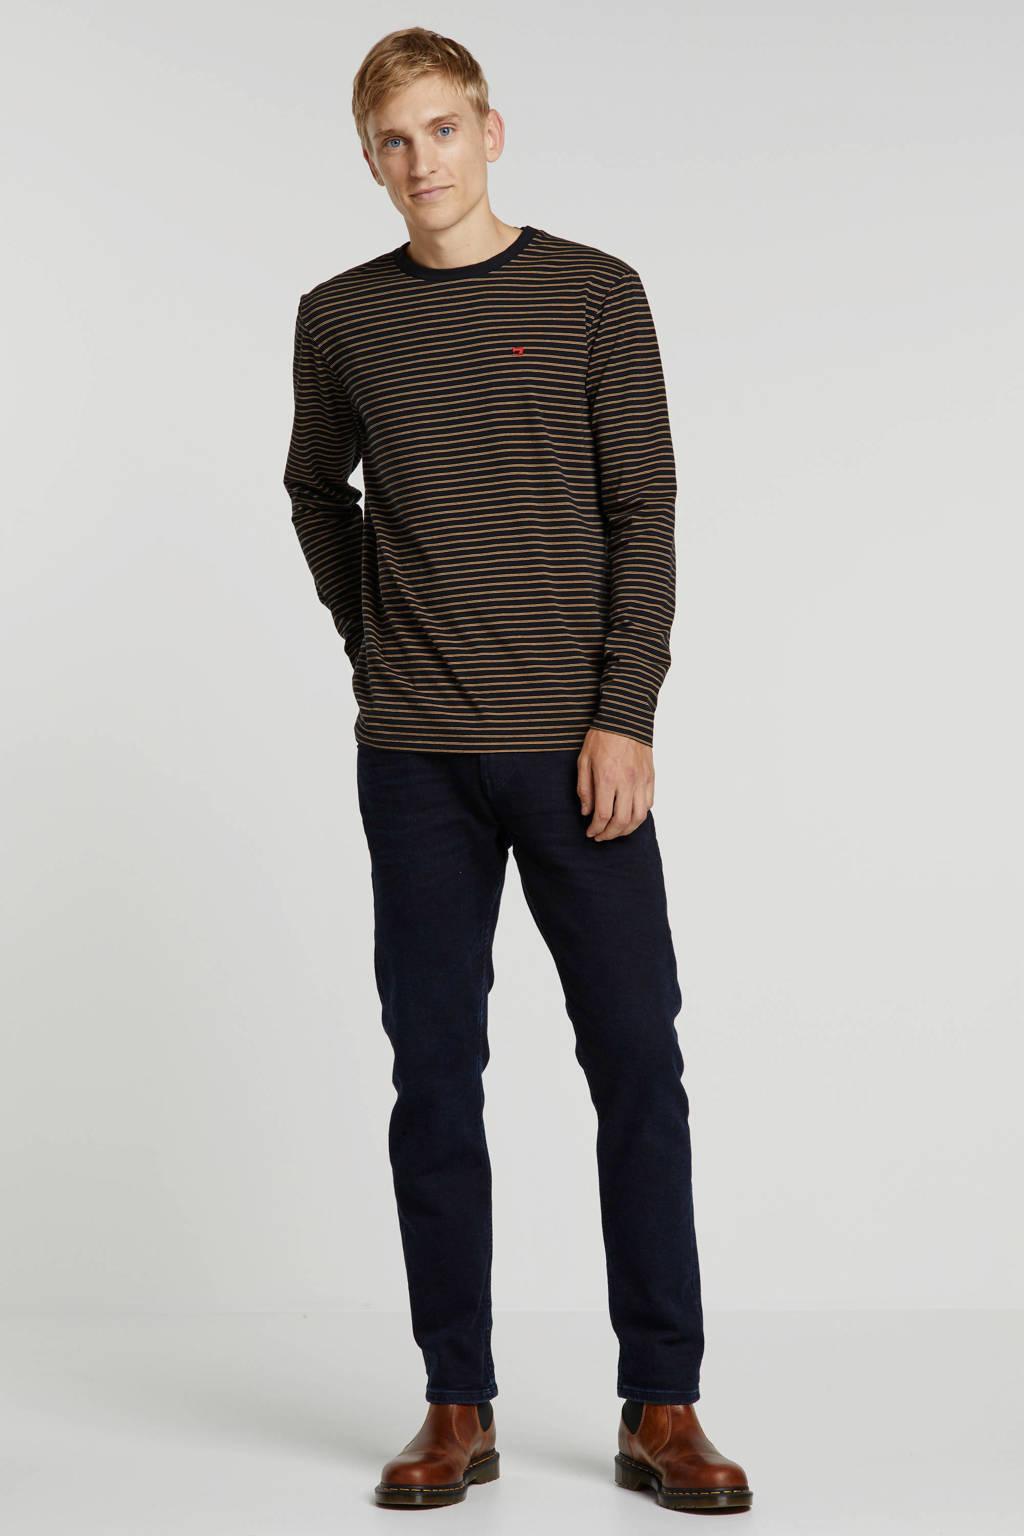 Tom Tailor slim fit jeans Piers blue black denim, 10170 blue black denim